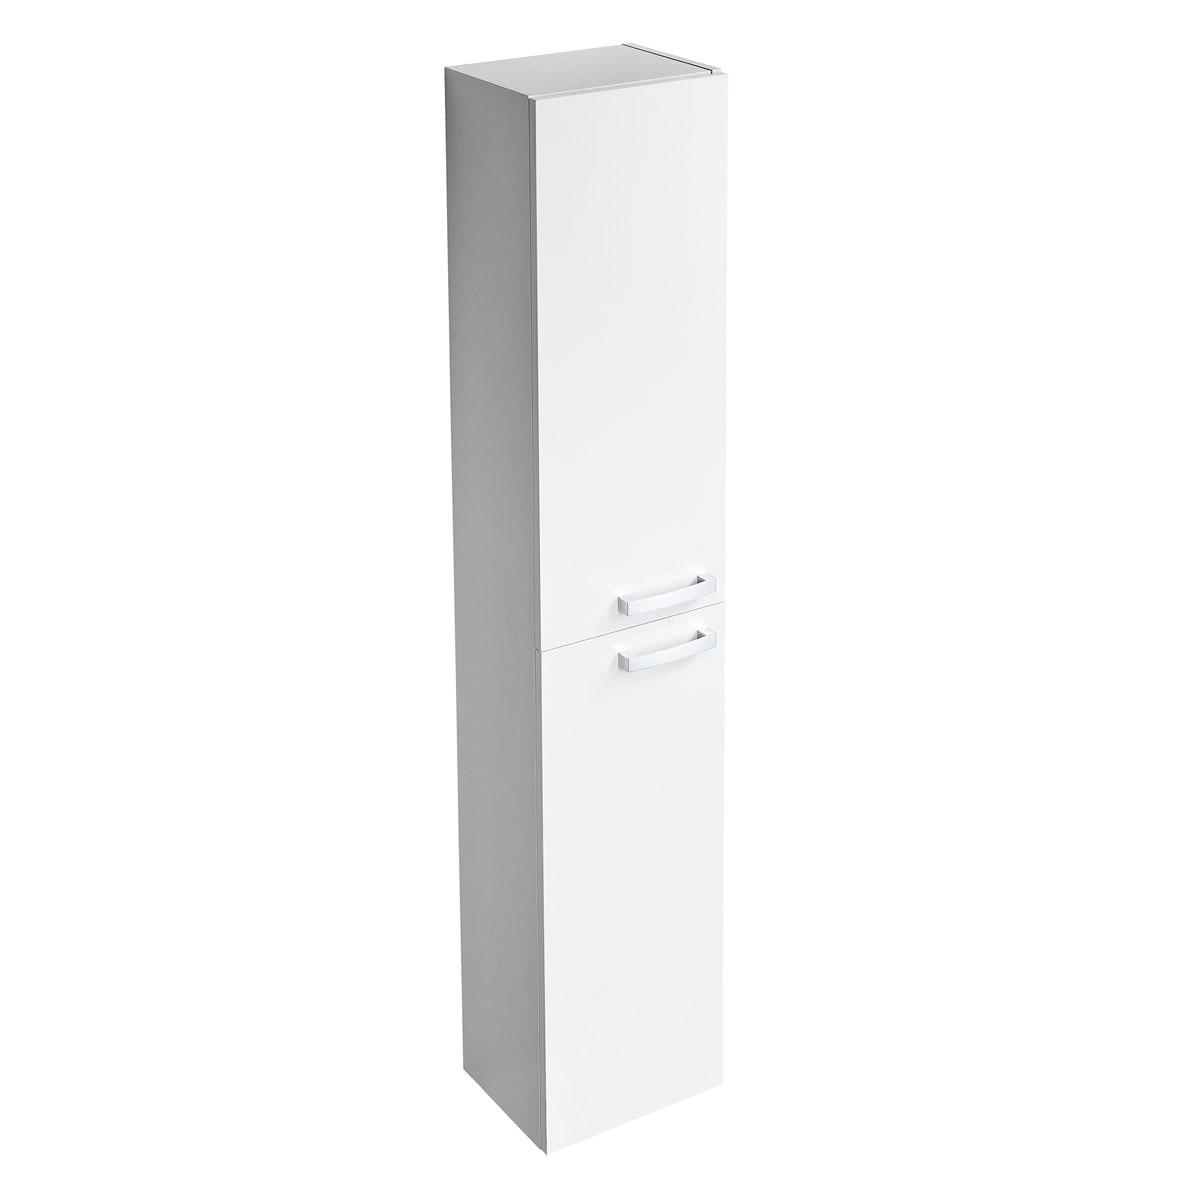 Ideal Standard Tempo gloss white storage unit 235mm